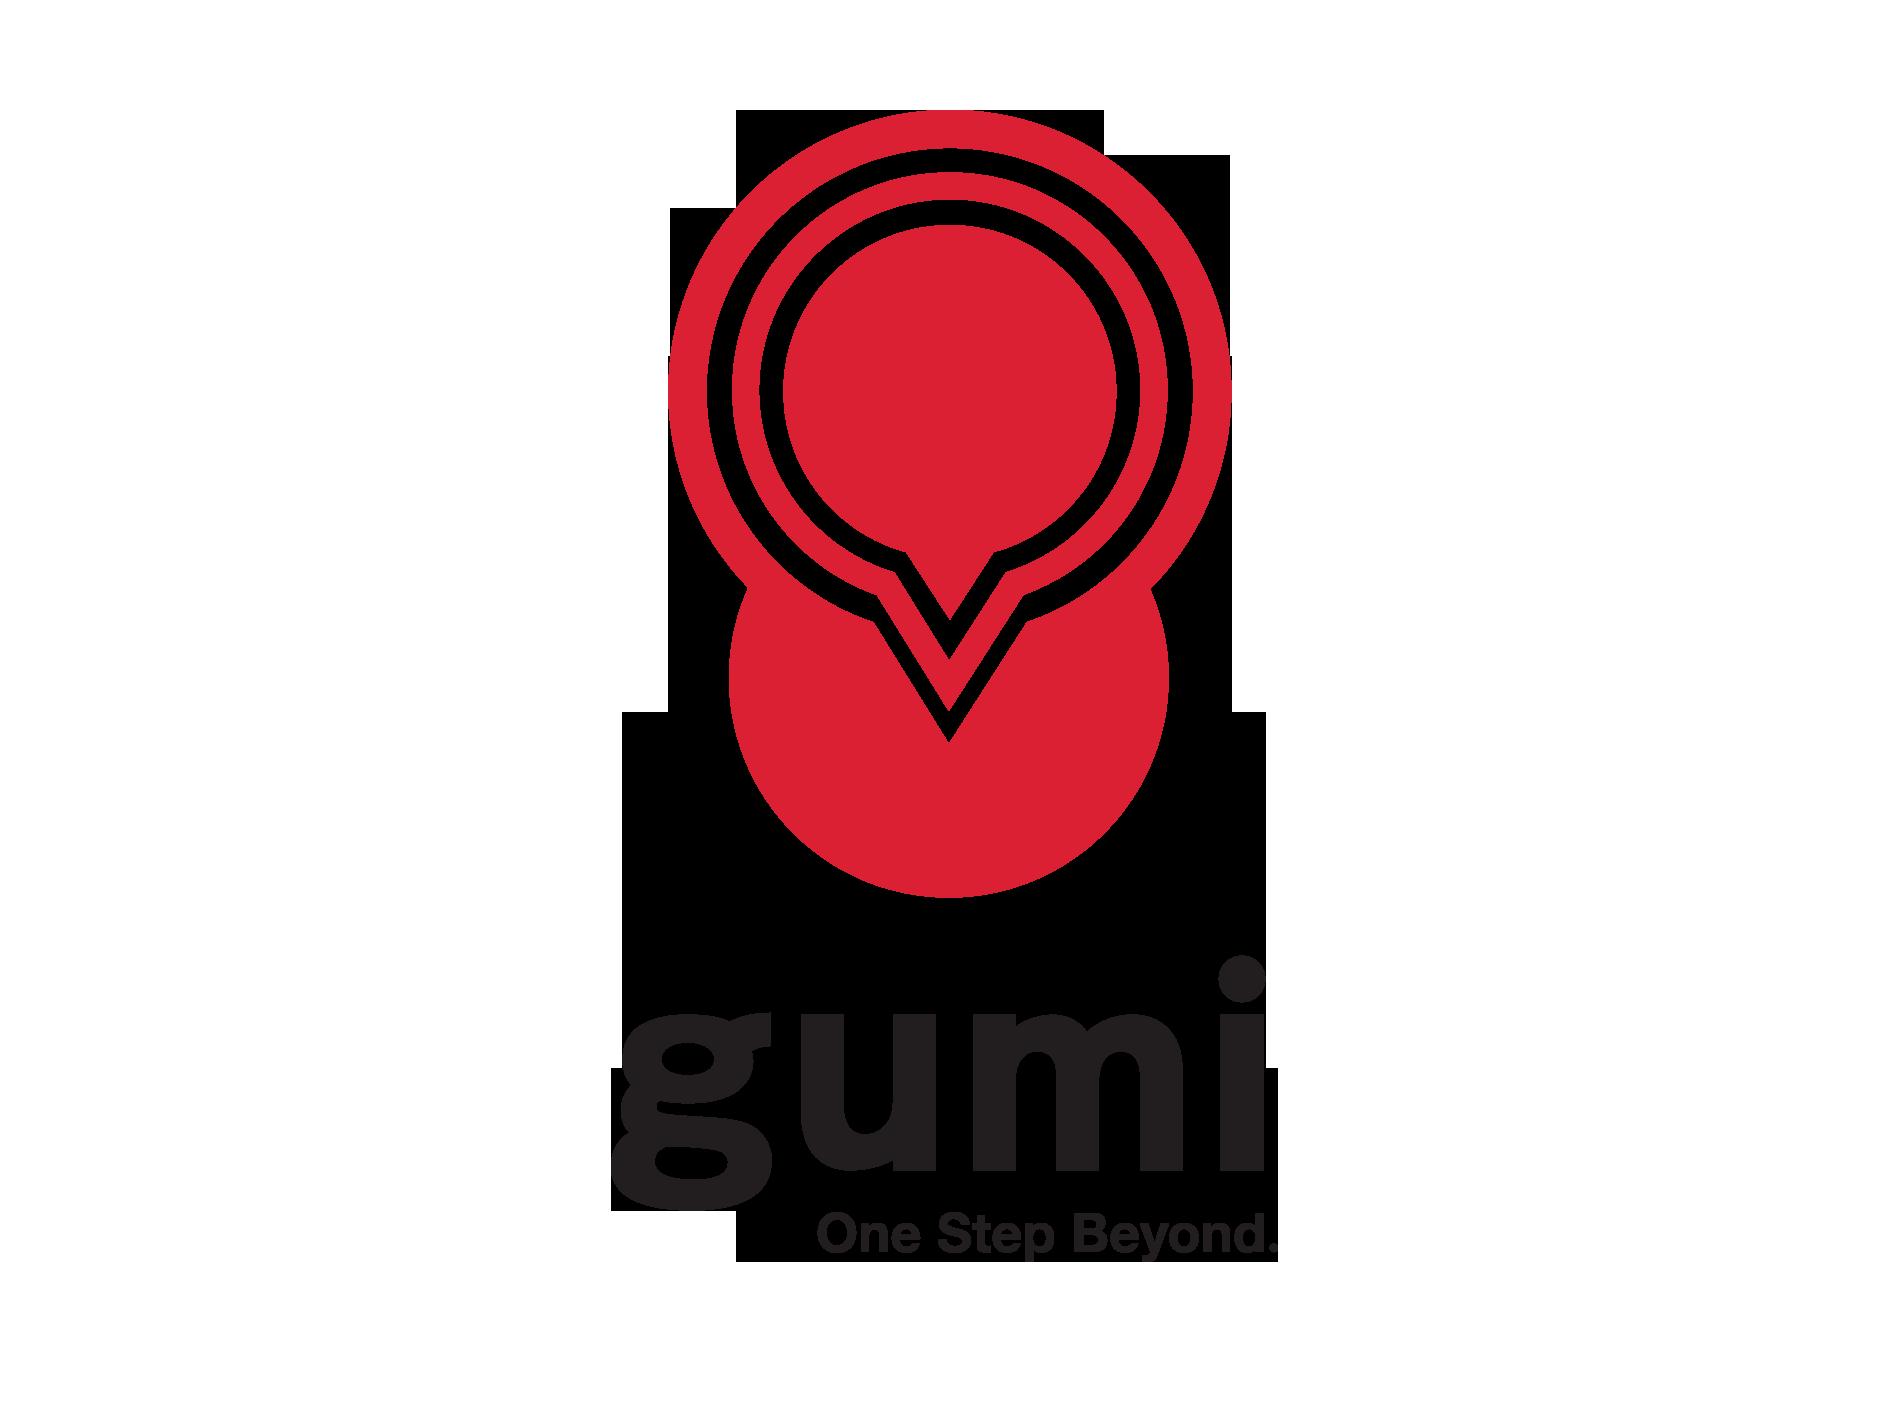 Gumi Europe